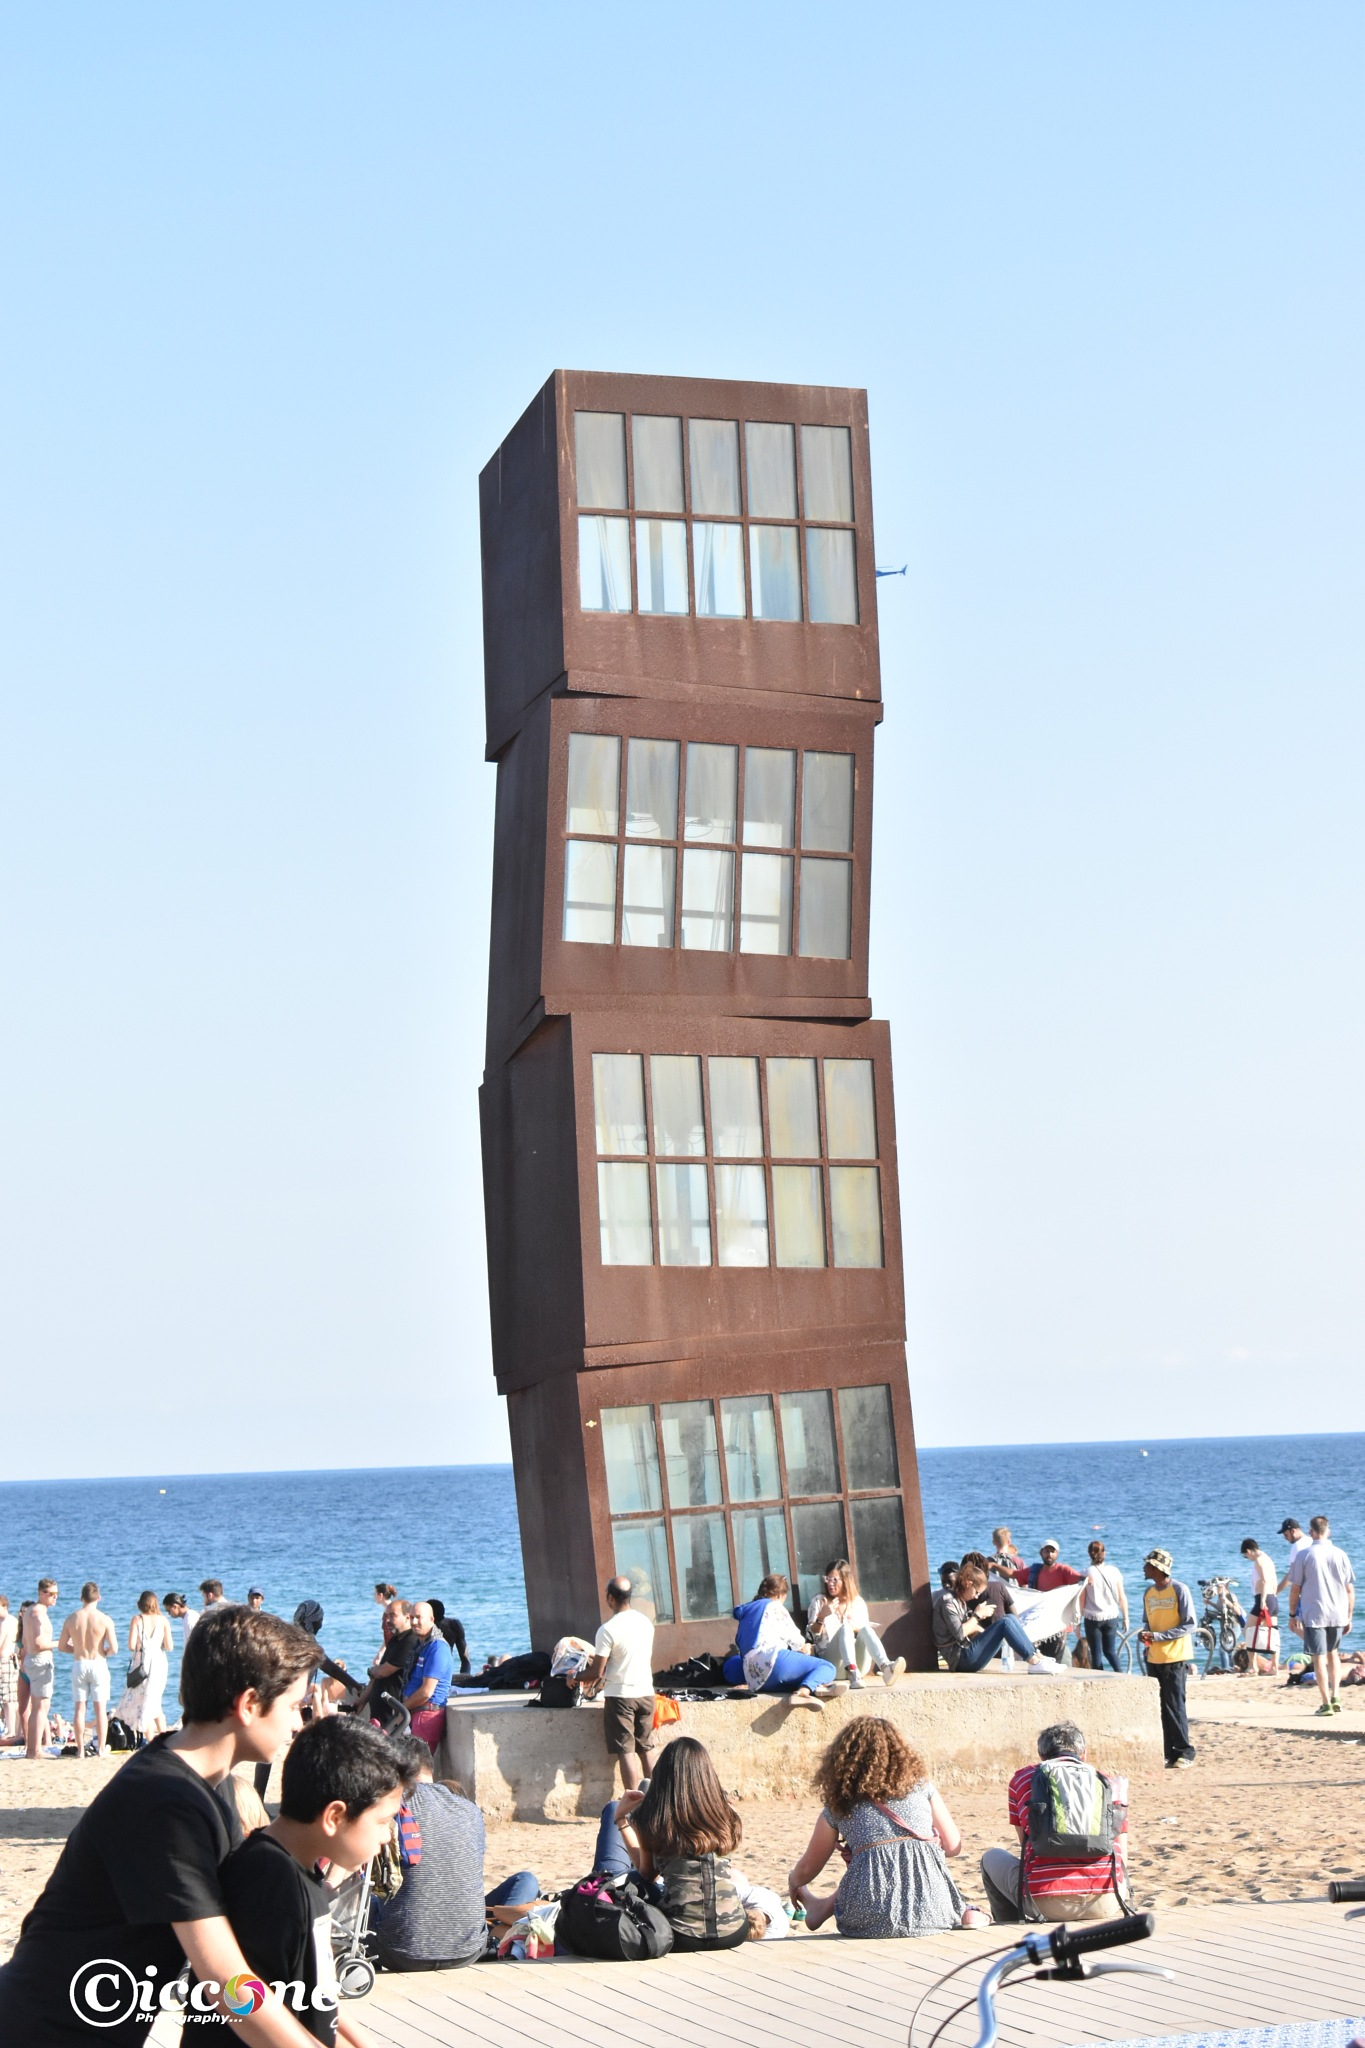 Barcelona Beach by Marc Ciccone